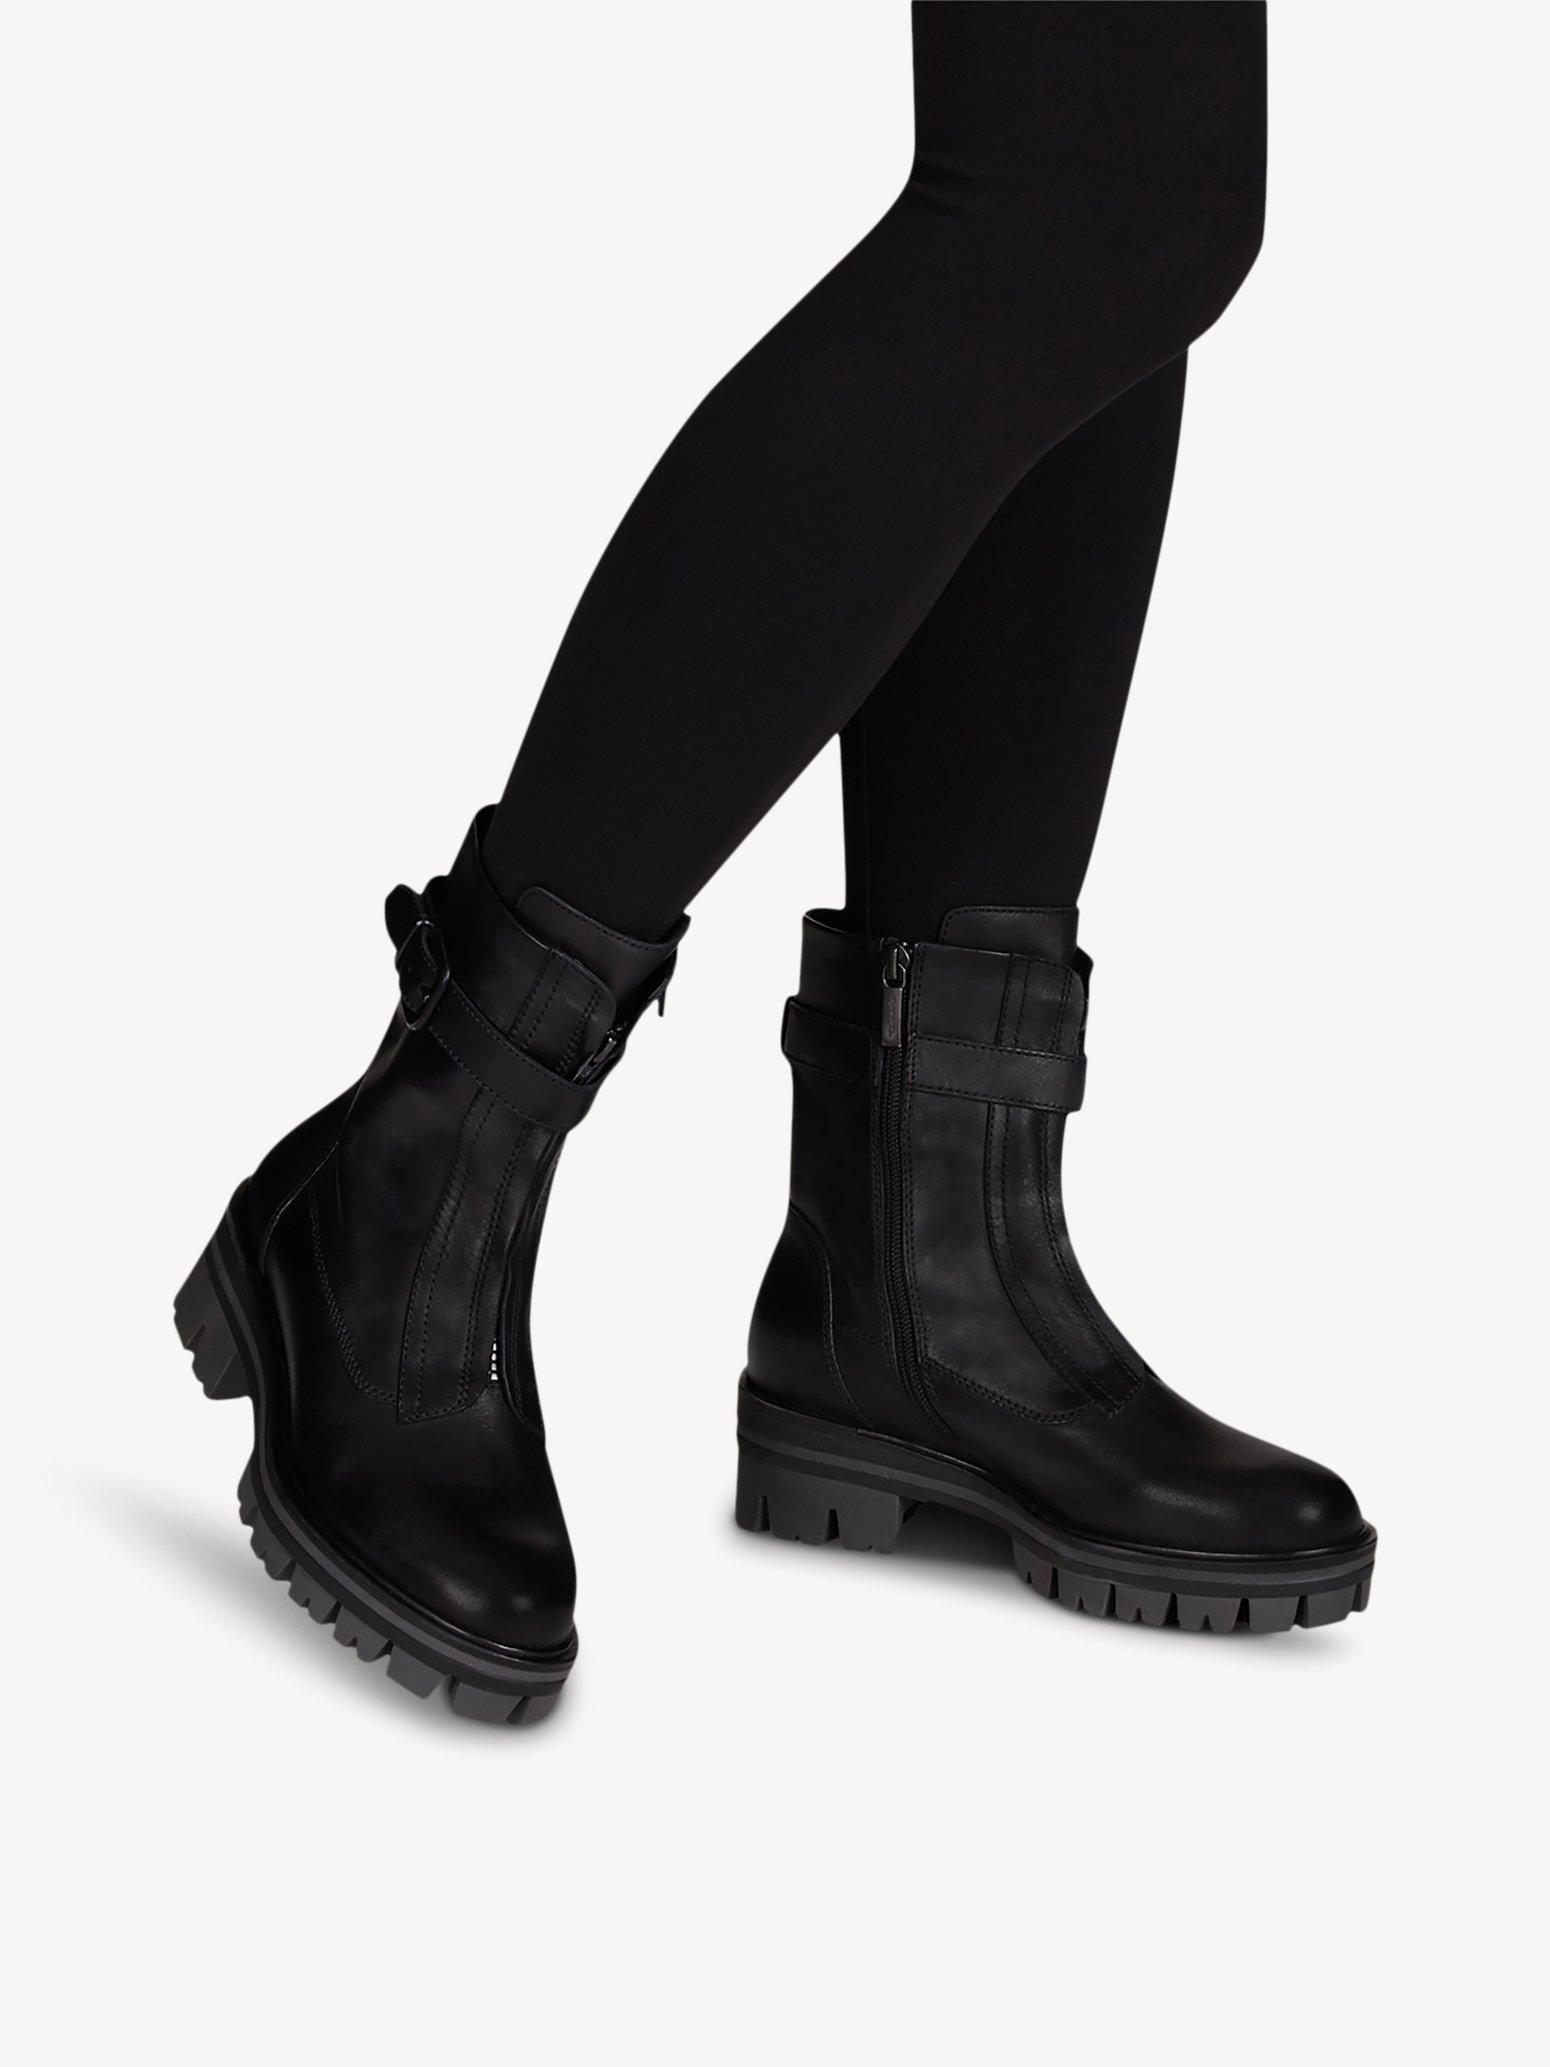 Ботинки Tamaris 1-1-25421-25-003